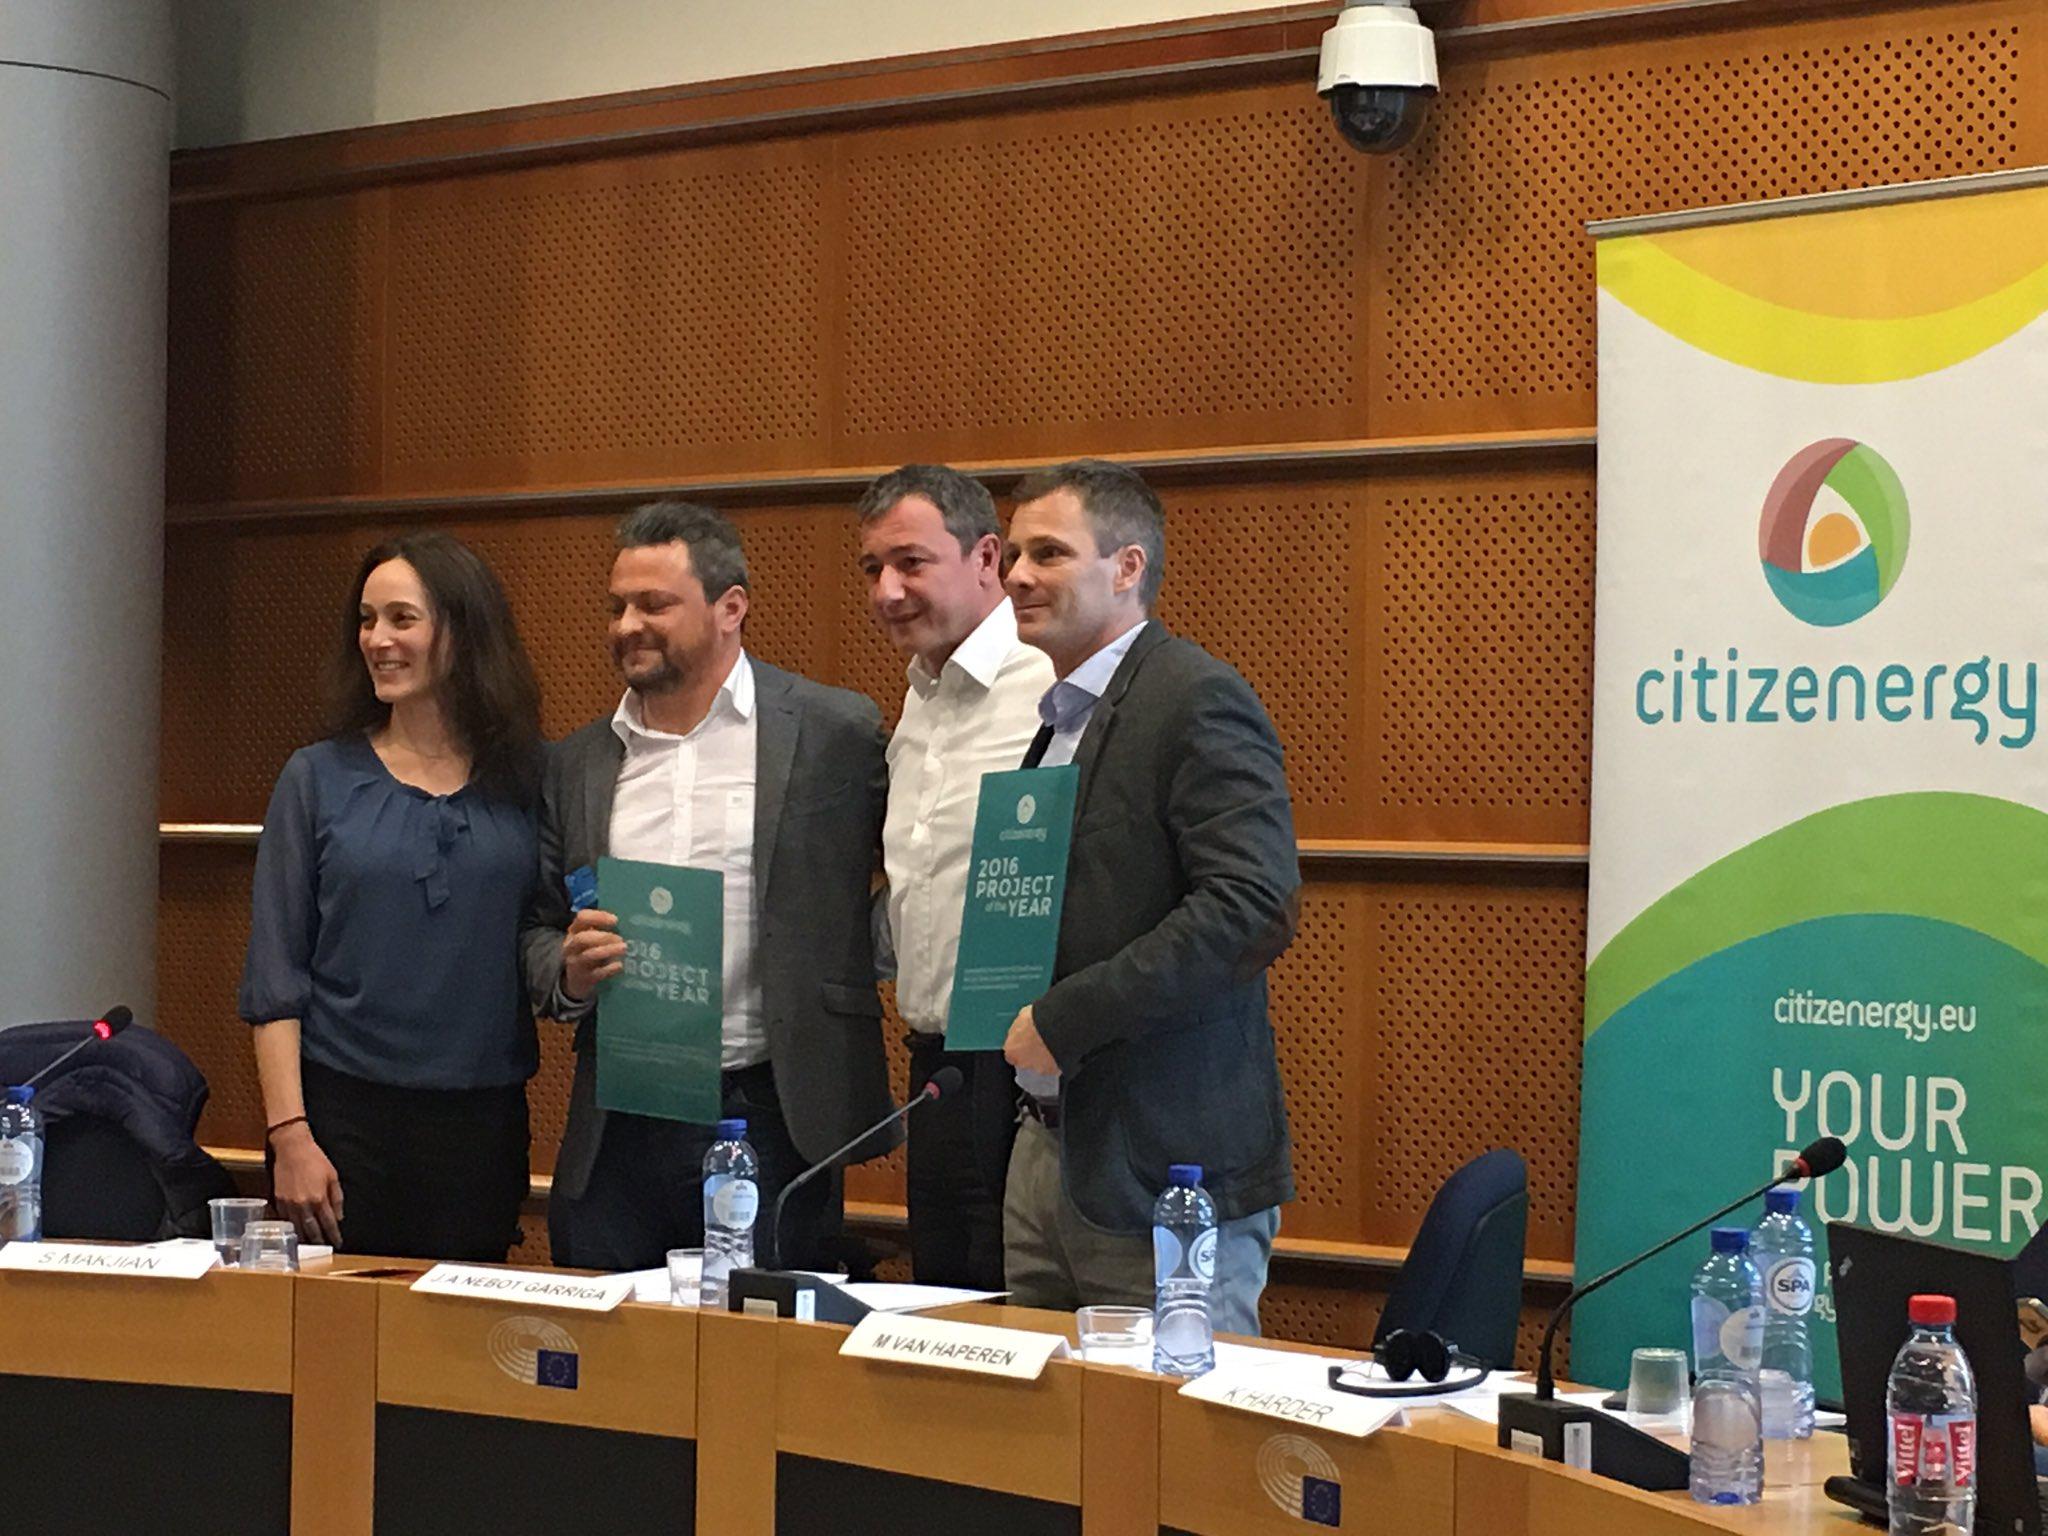 Citizenergy Award otorgado a ECrowd!